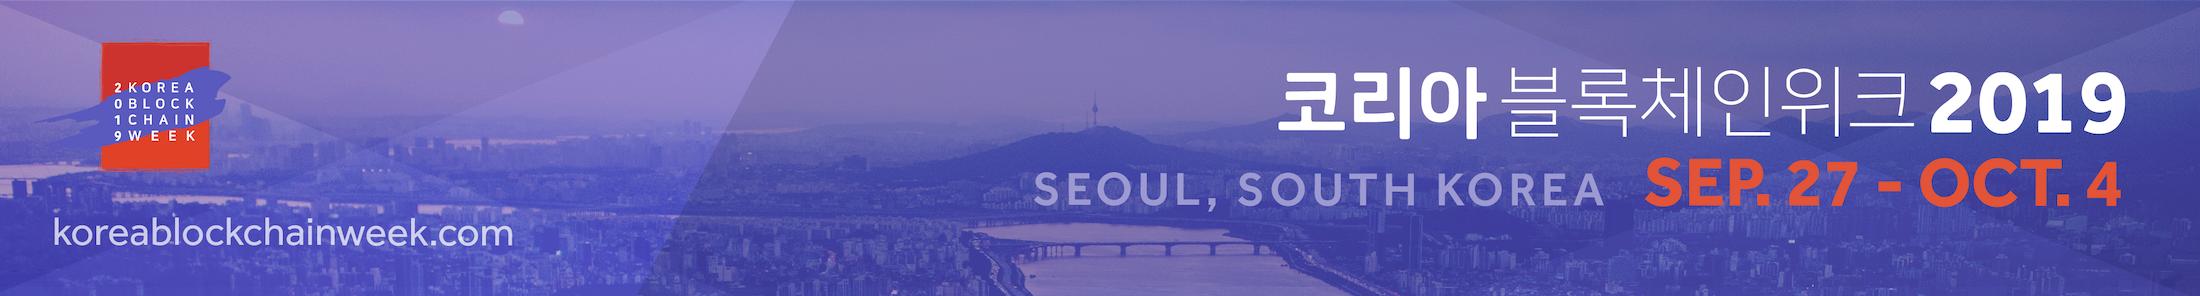 KoreaBlockchainWeek